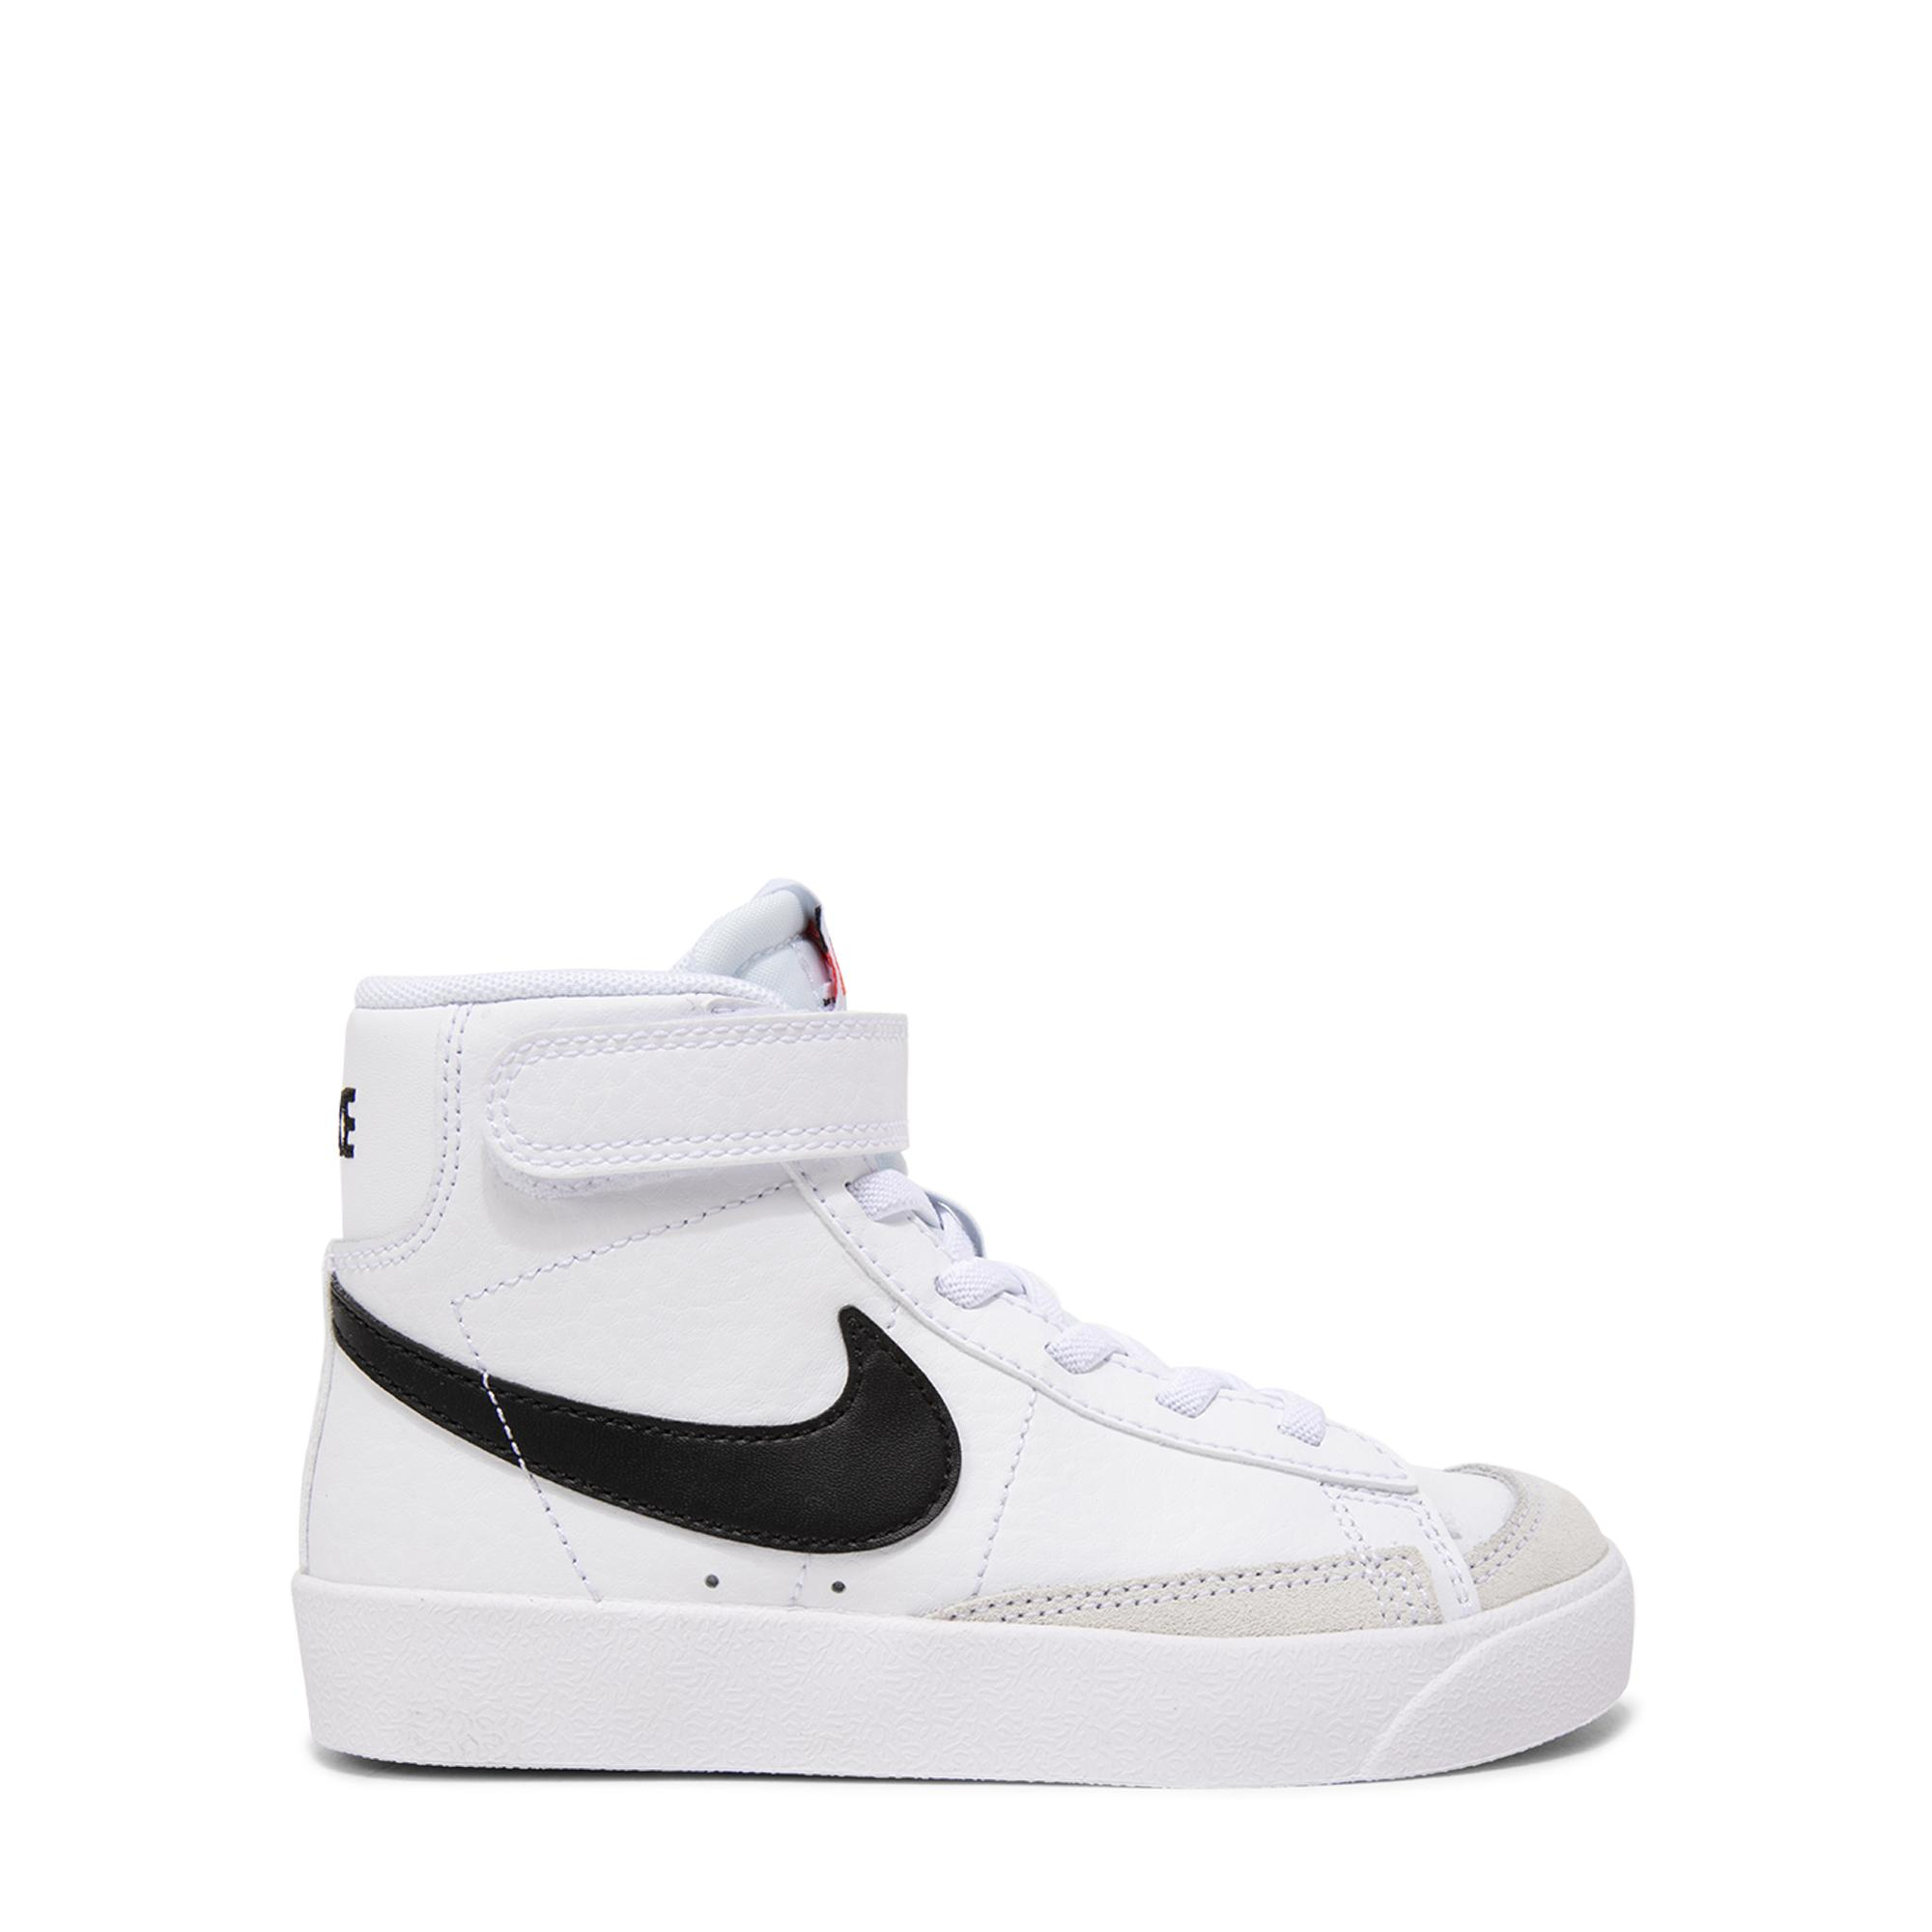 Blazer high-top sneakers